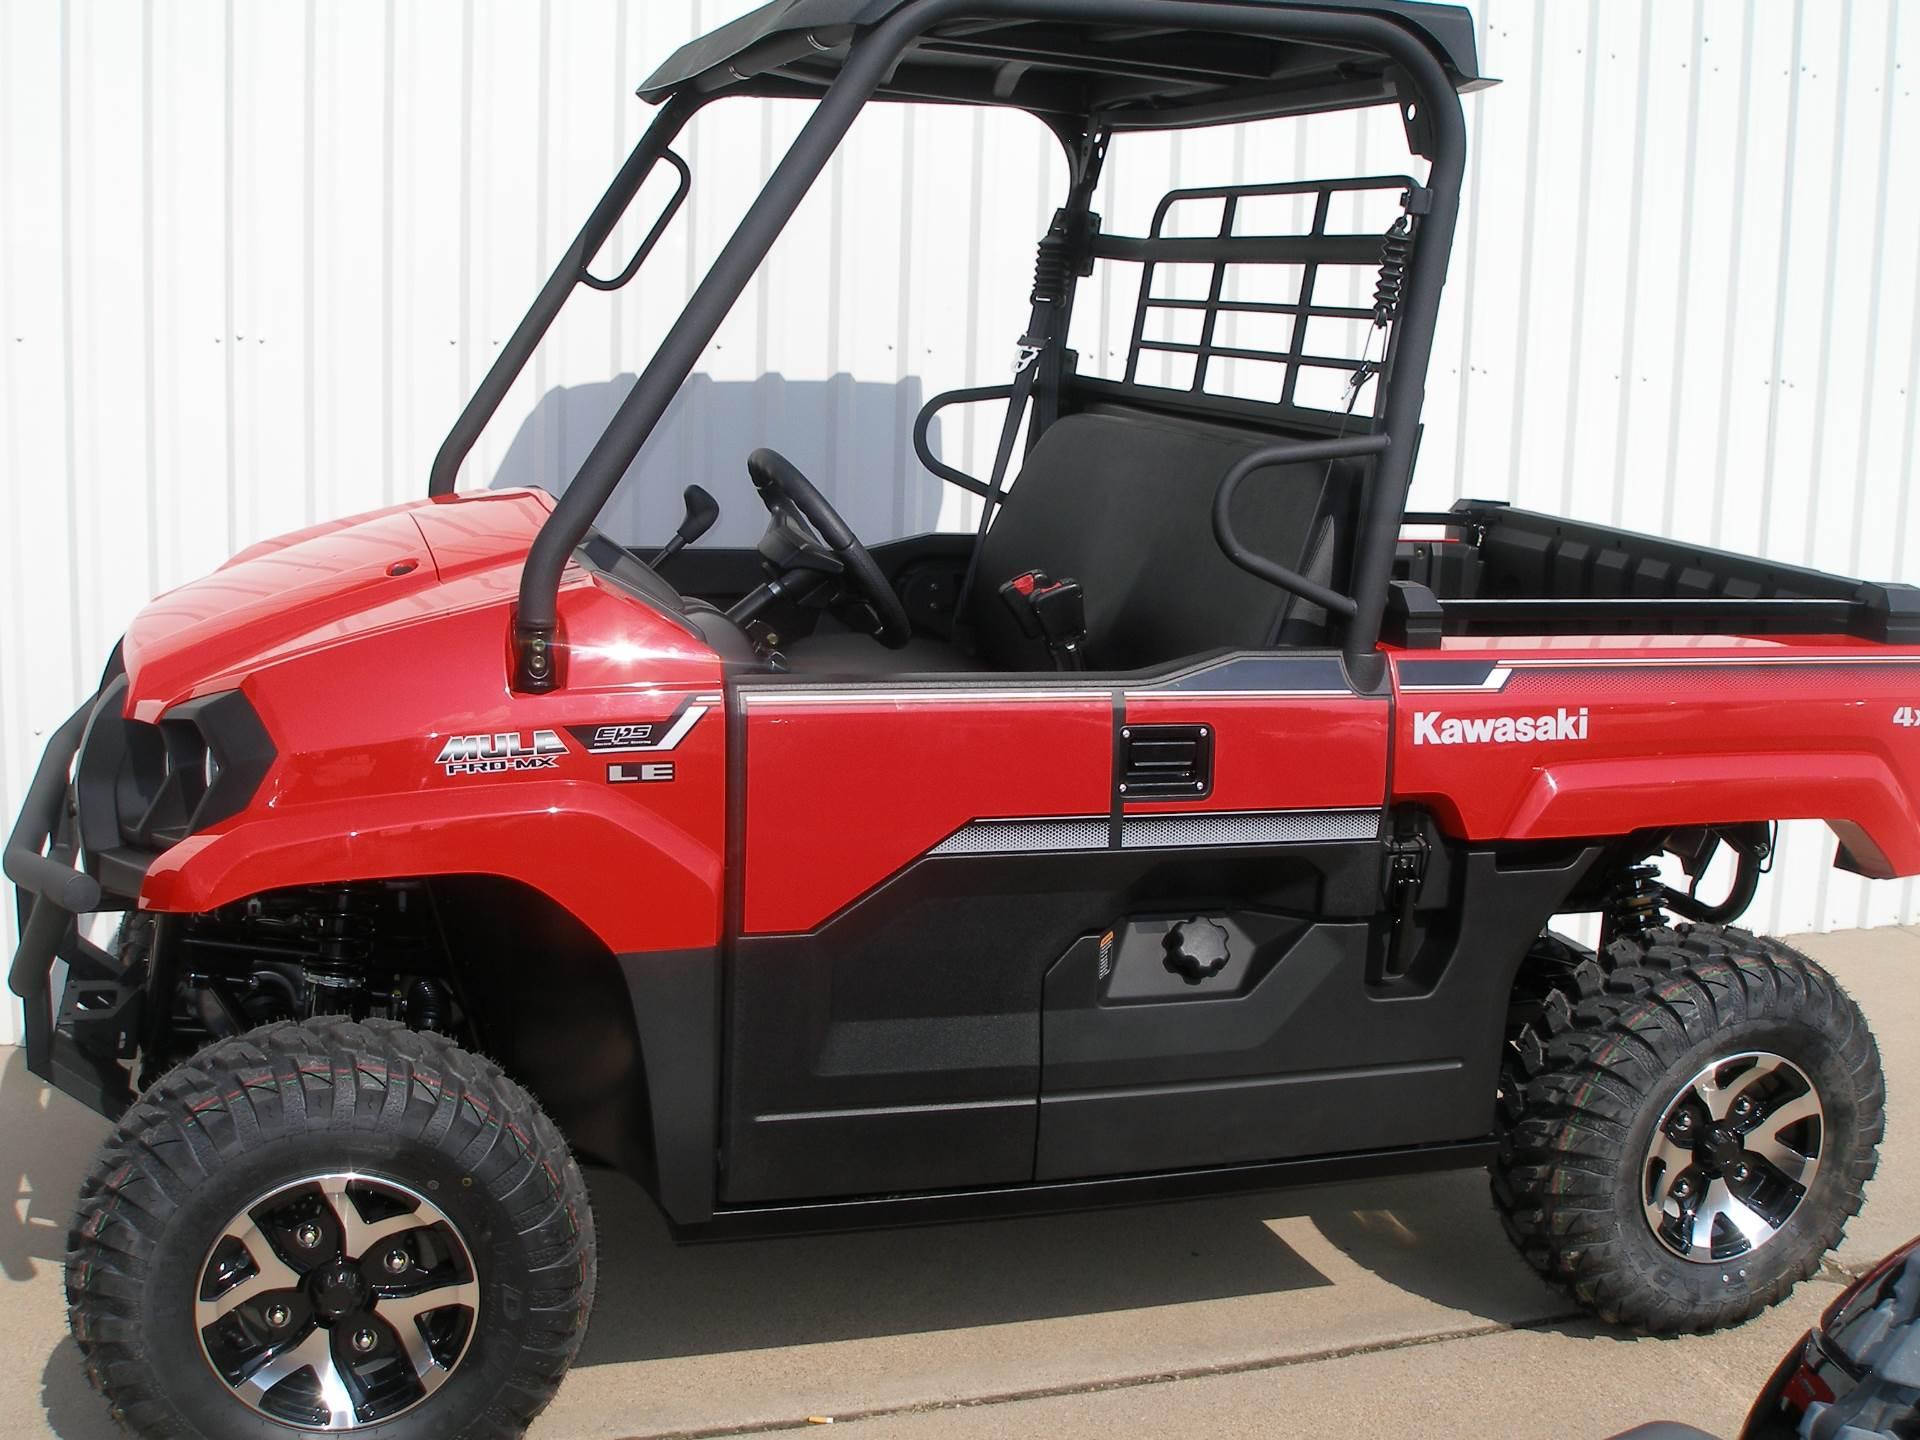 2019 Kawasaki Mule PRO-MX EPS LE in Abilene, Texas